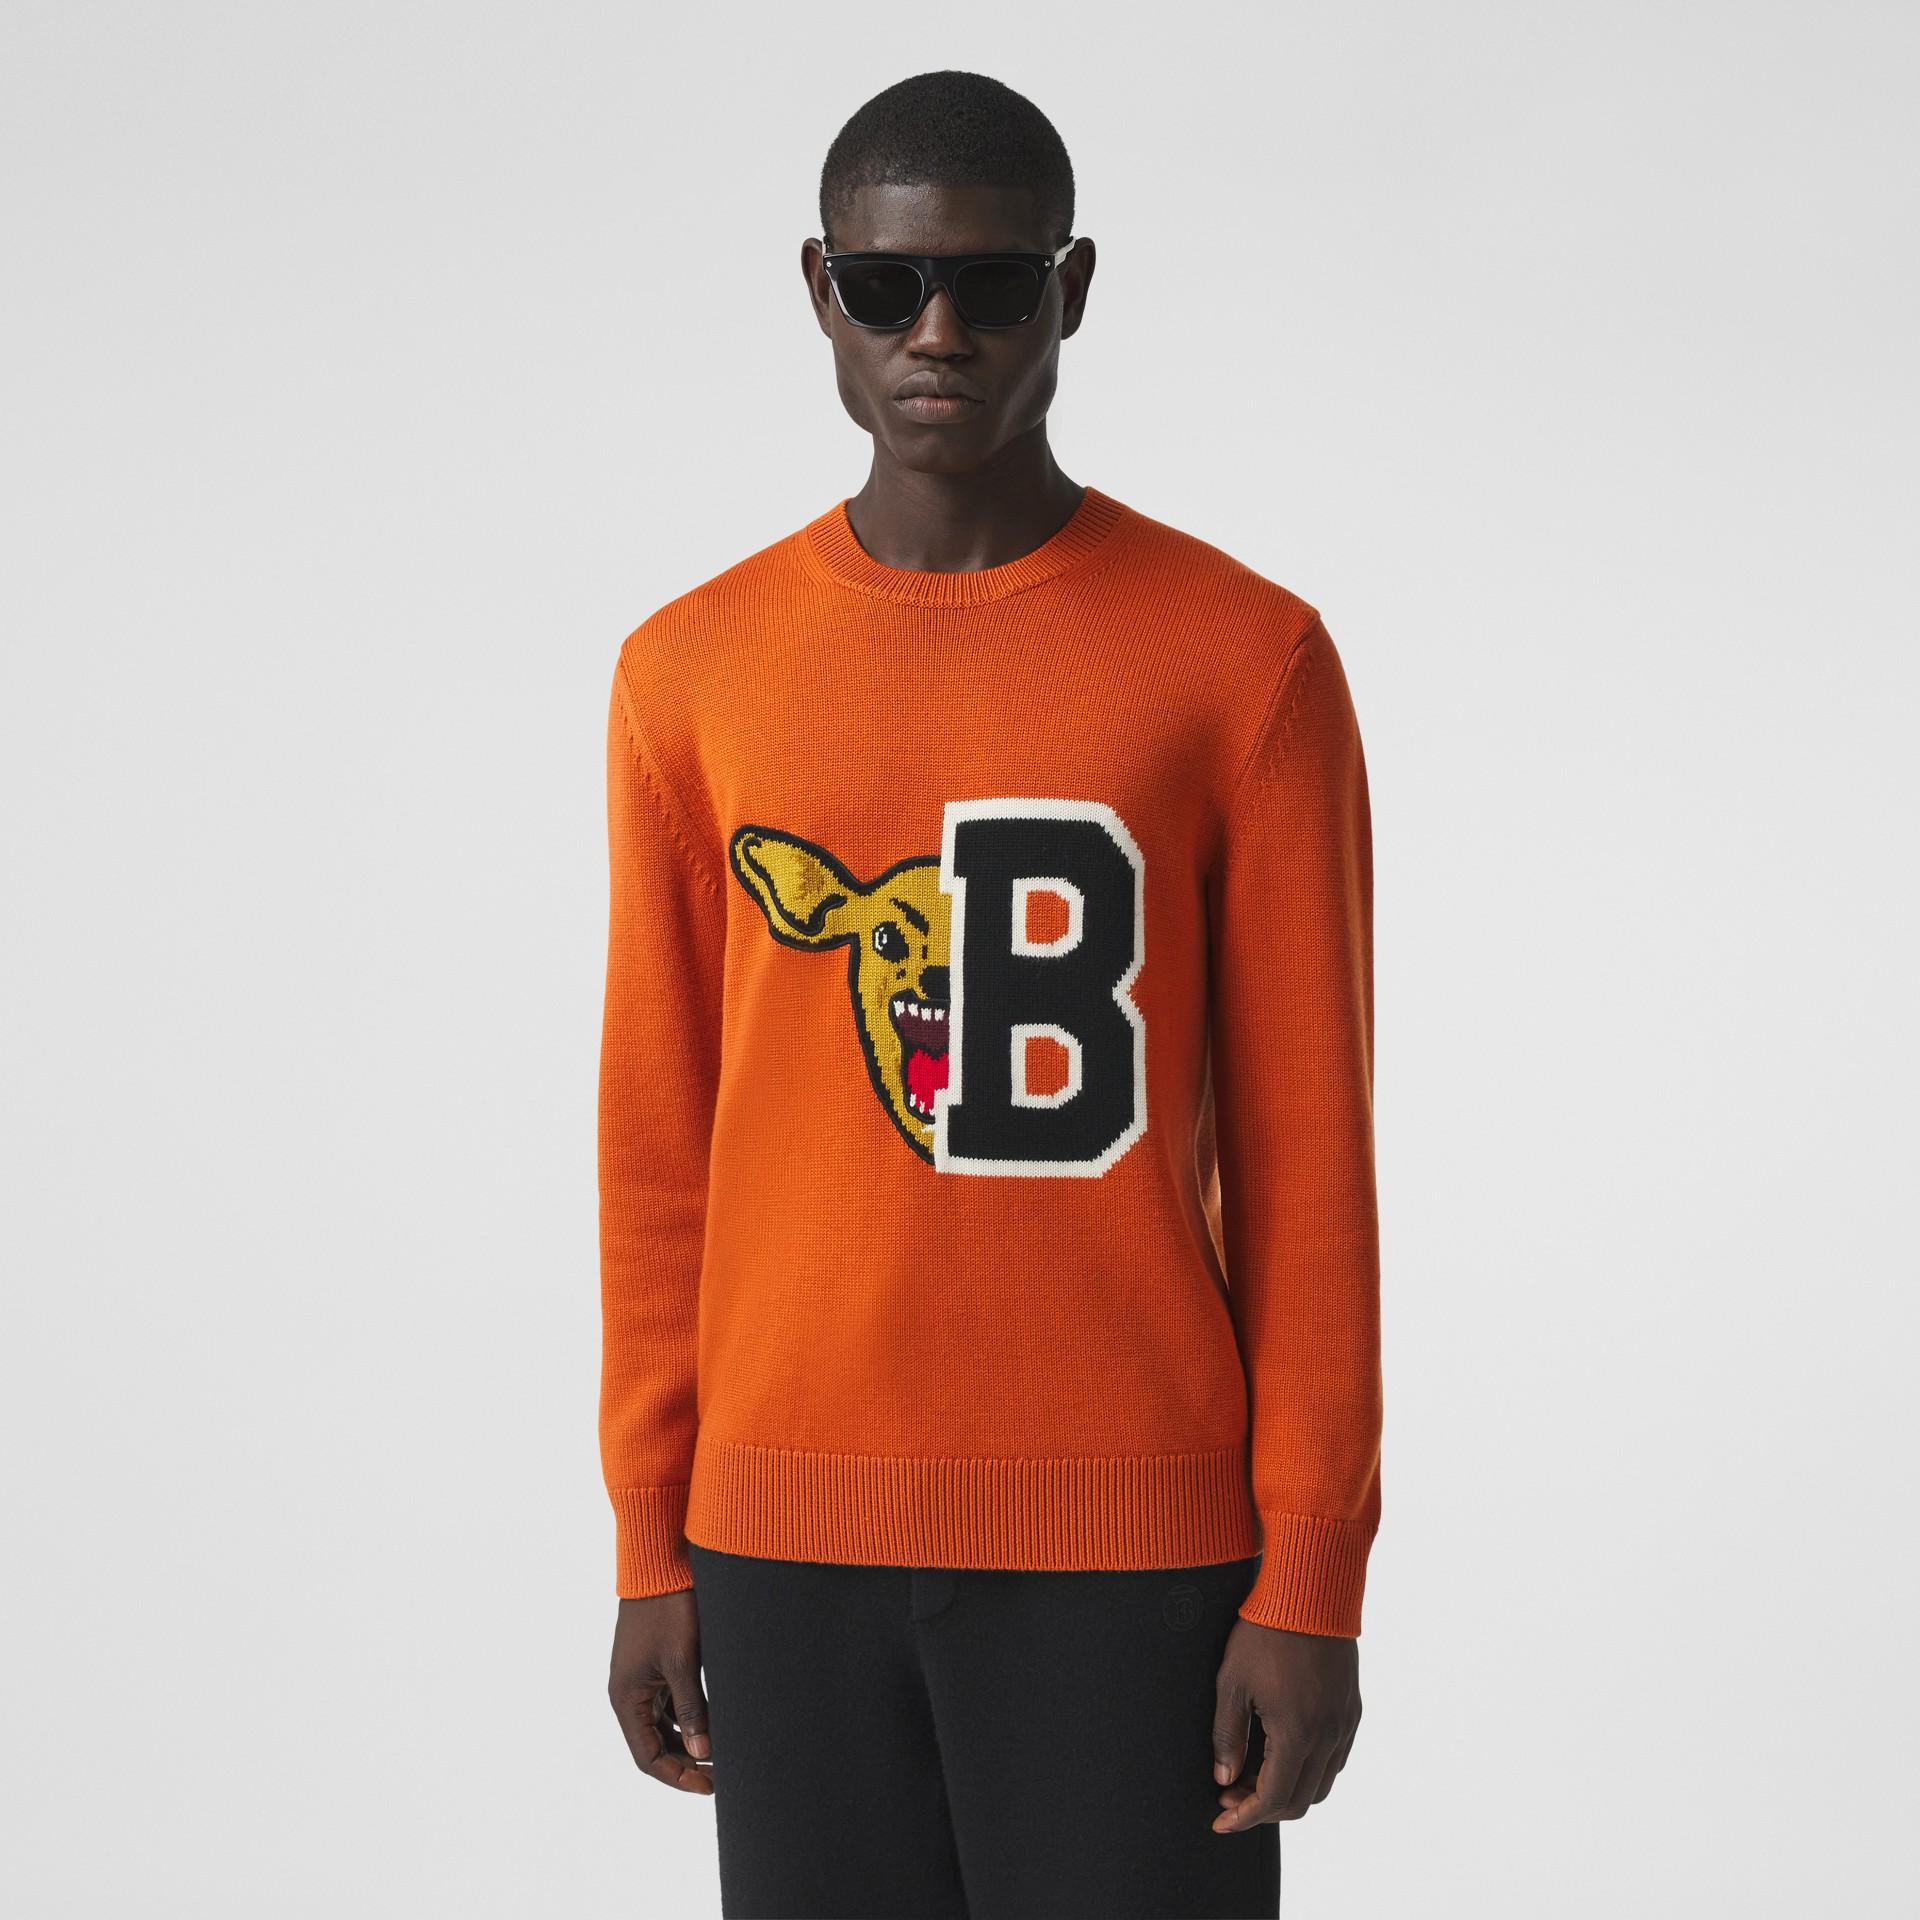 Varsity Graphic Merino Wool Jacquard Sweater in Burnt Orange - Men | Burberry - gallery image 0